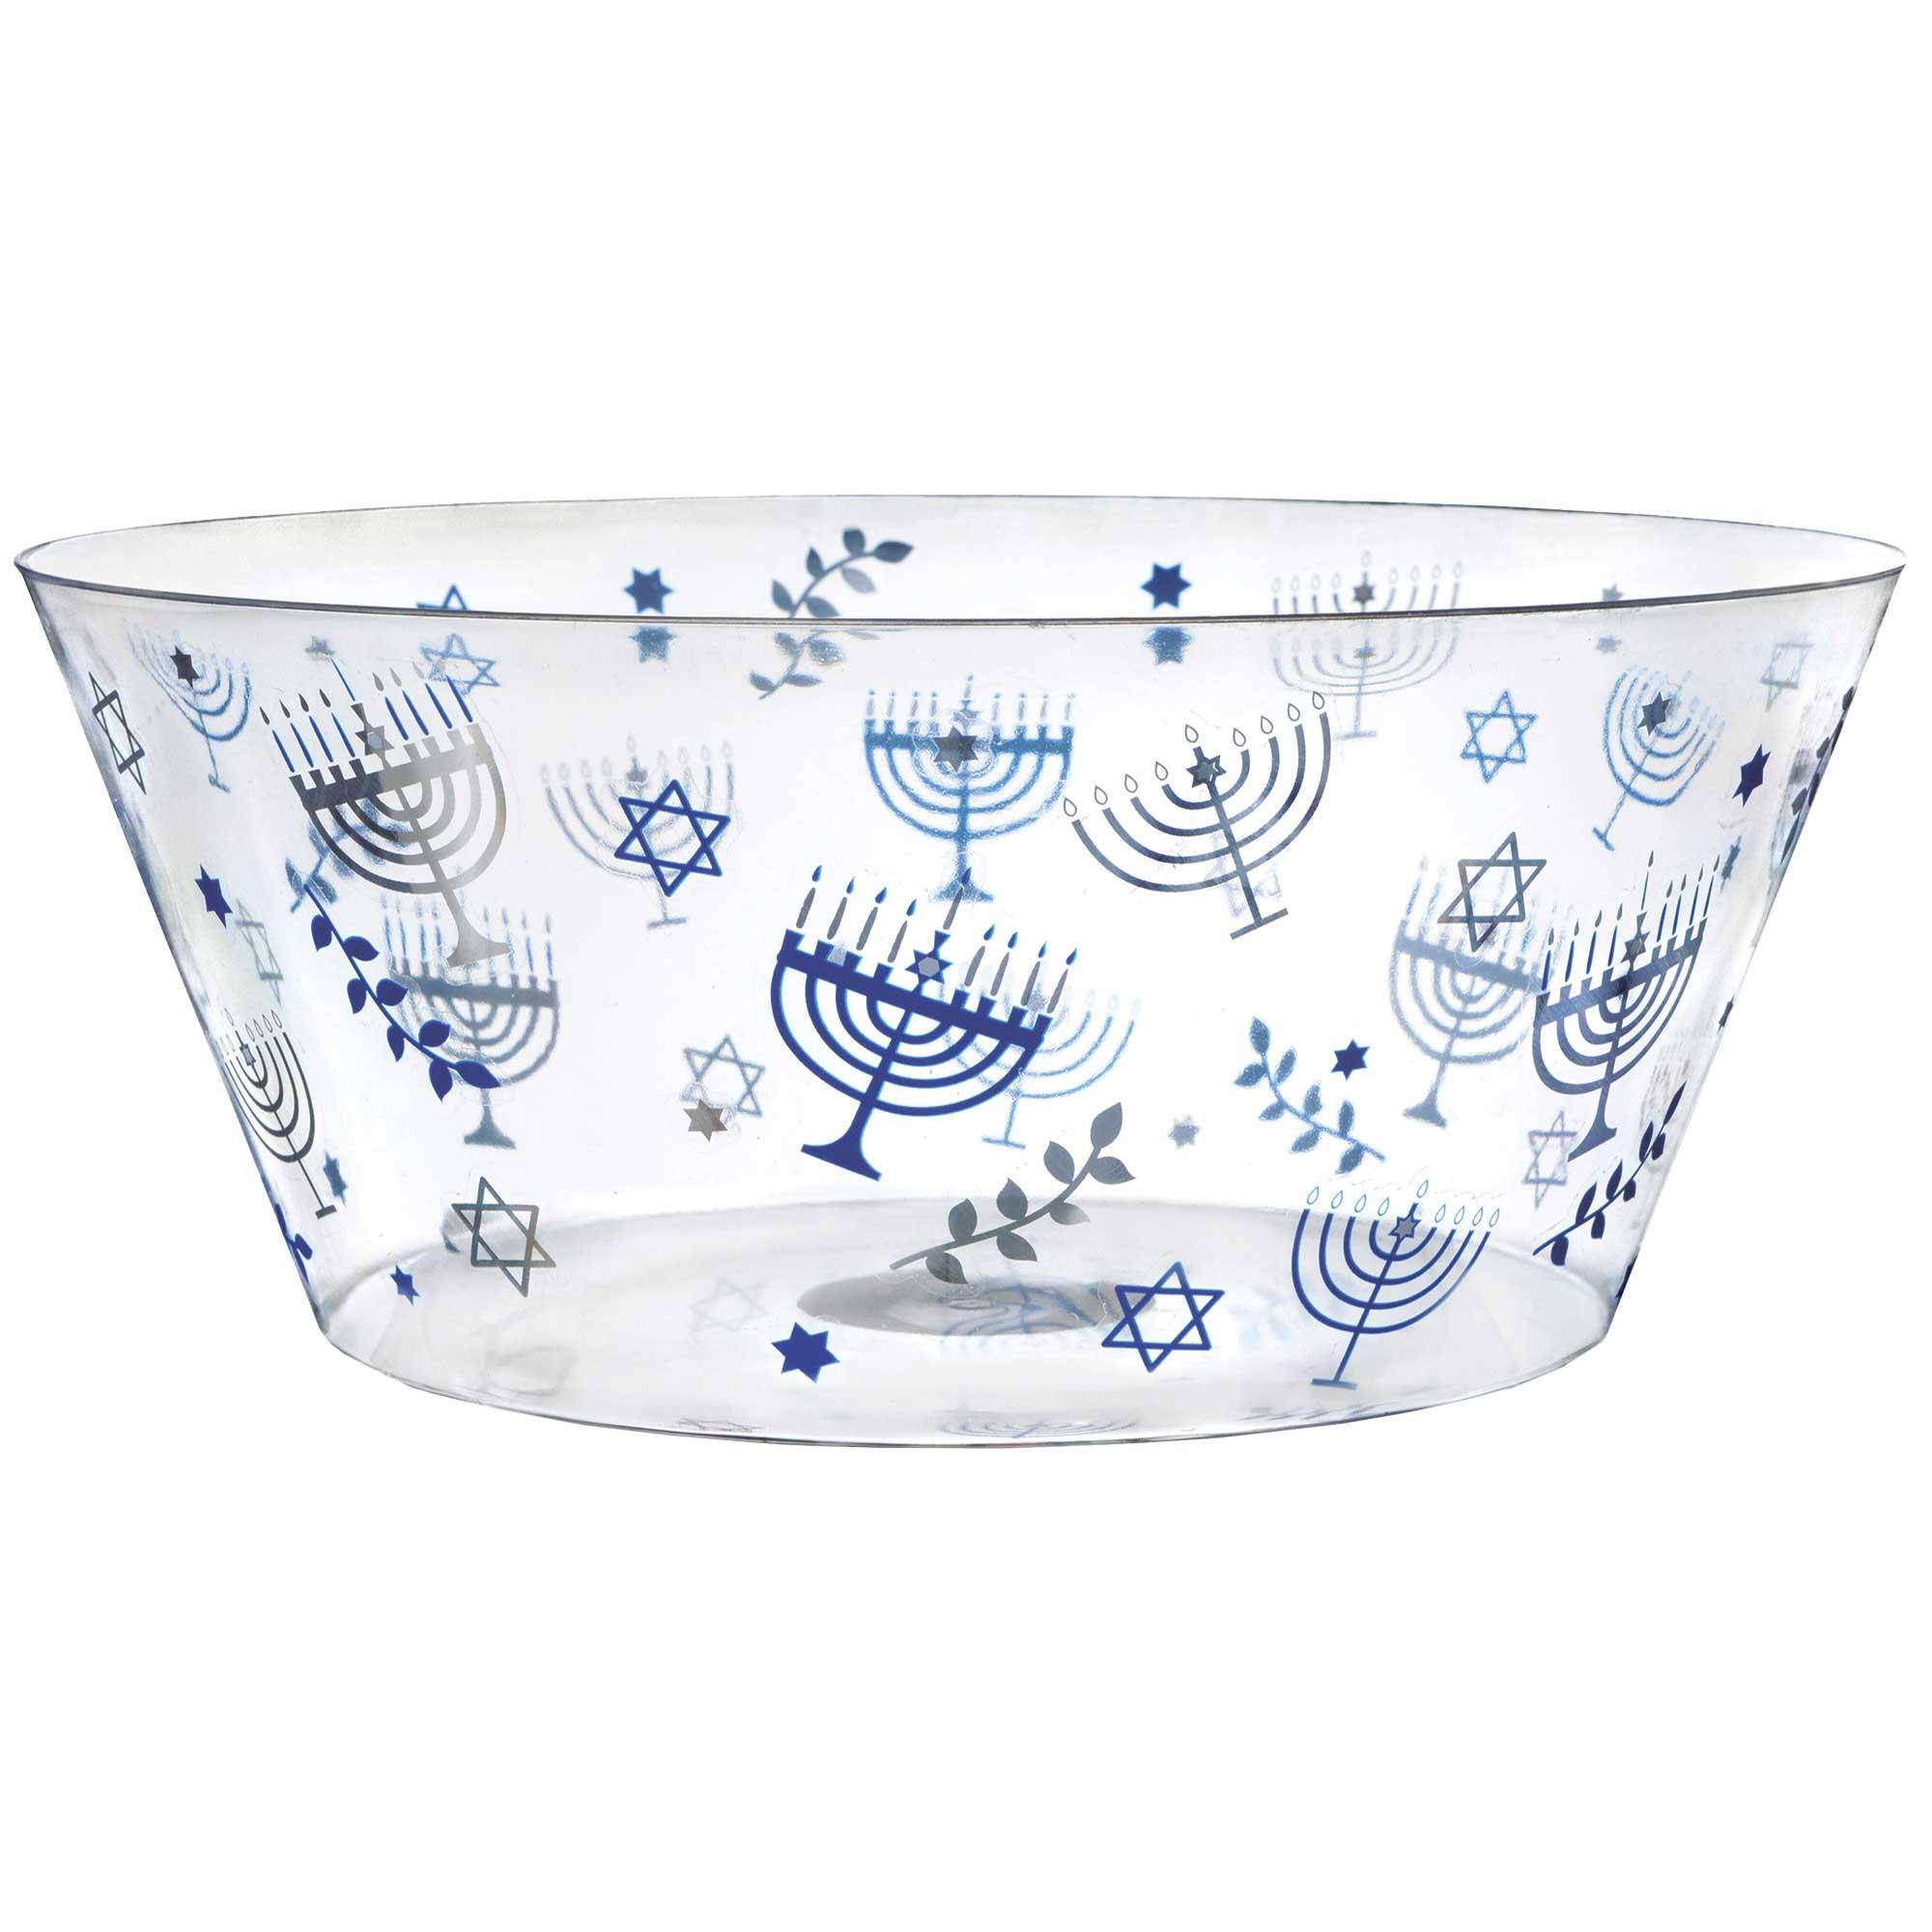 Hanukkah Plastic Serving Bowl Hot Stamped 3.5L